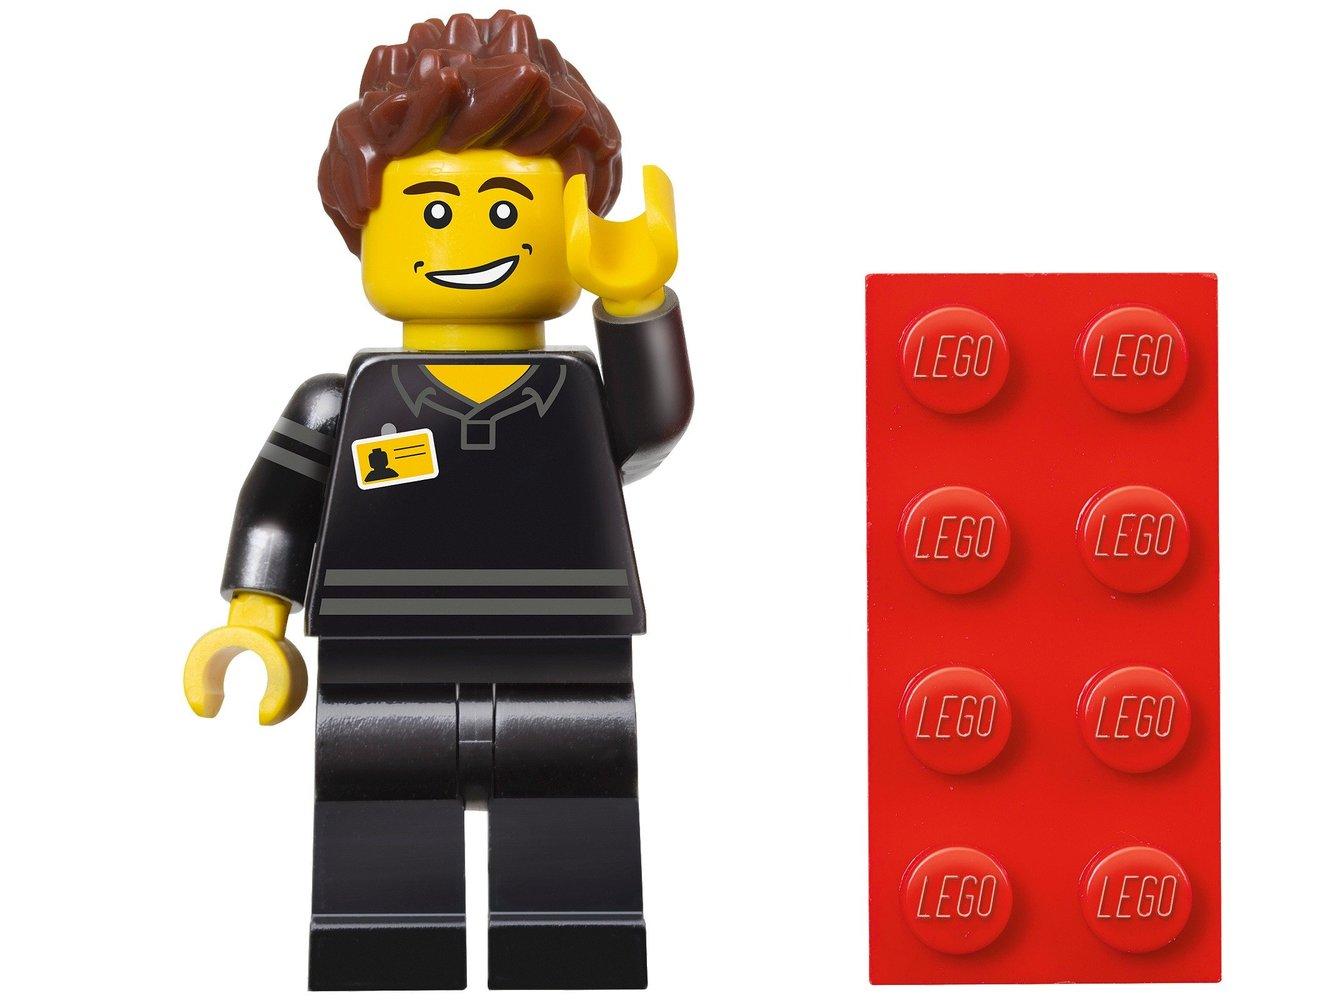 LEGO Store Employee